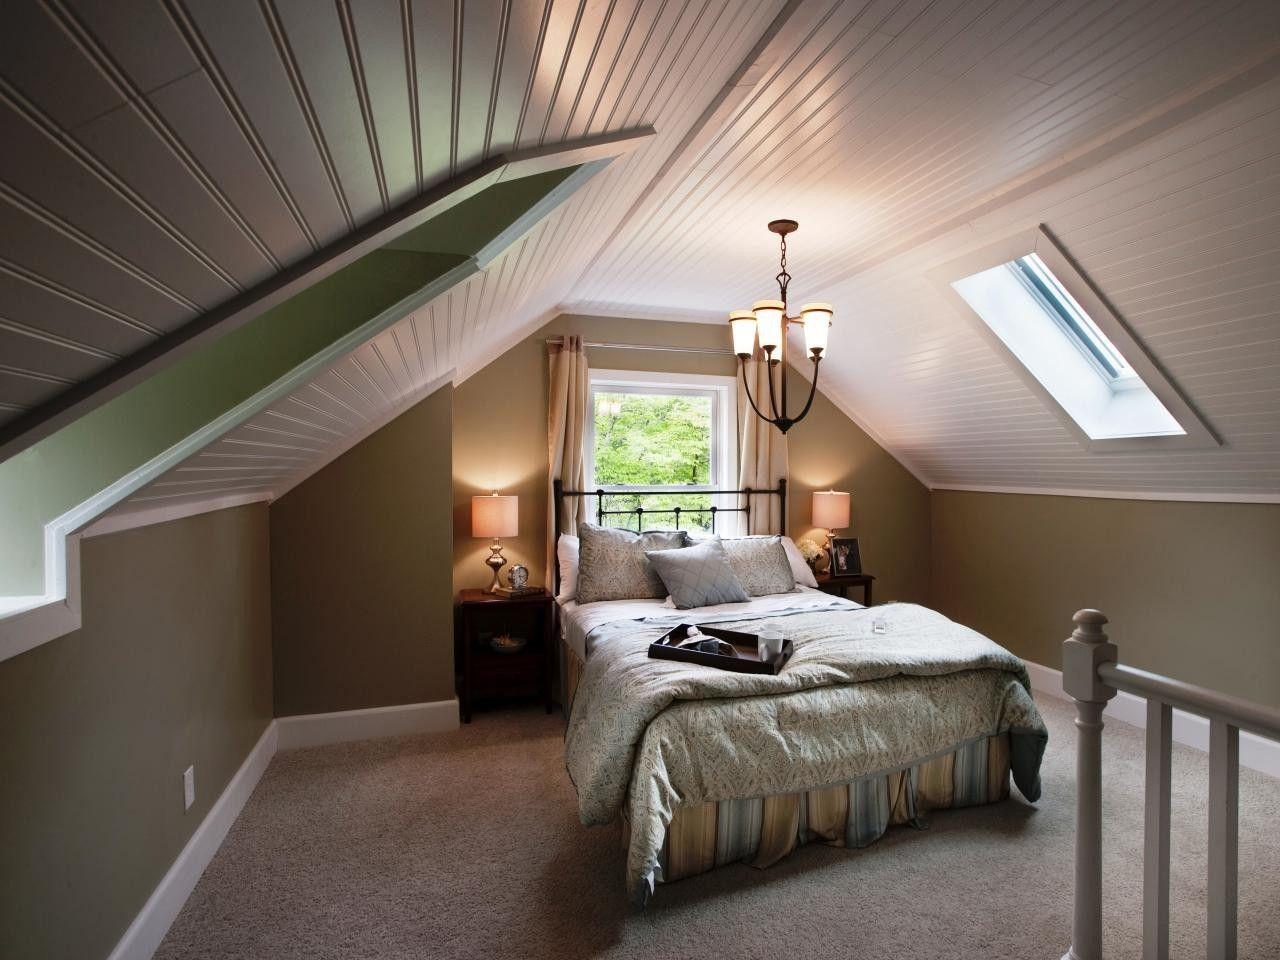 Decorating Ideas For A Dormer Bedroom Attic Bedroom Designs Attic Master Bedroom Remodel Bedroom